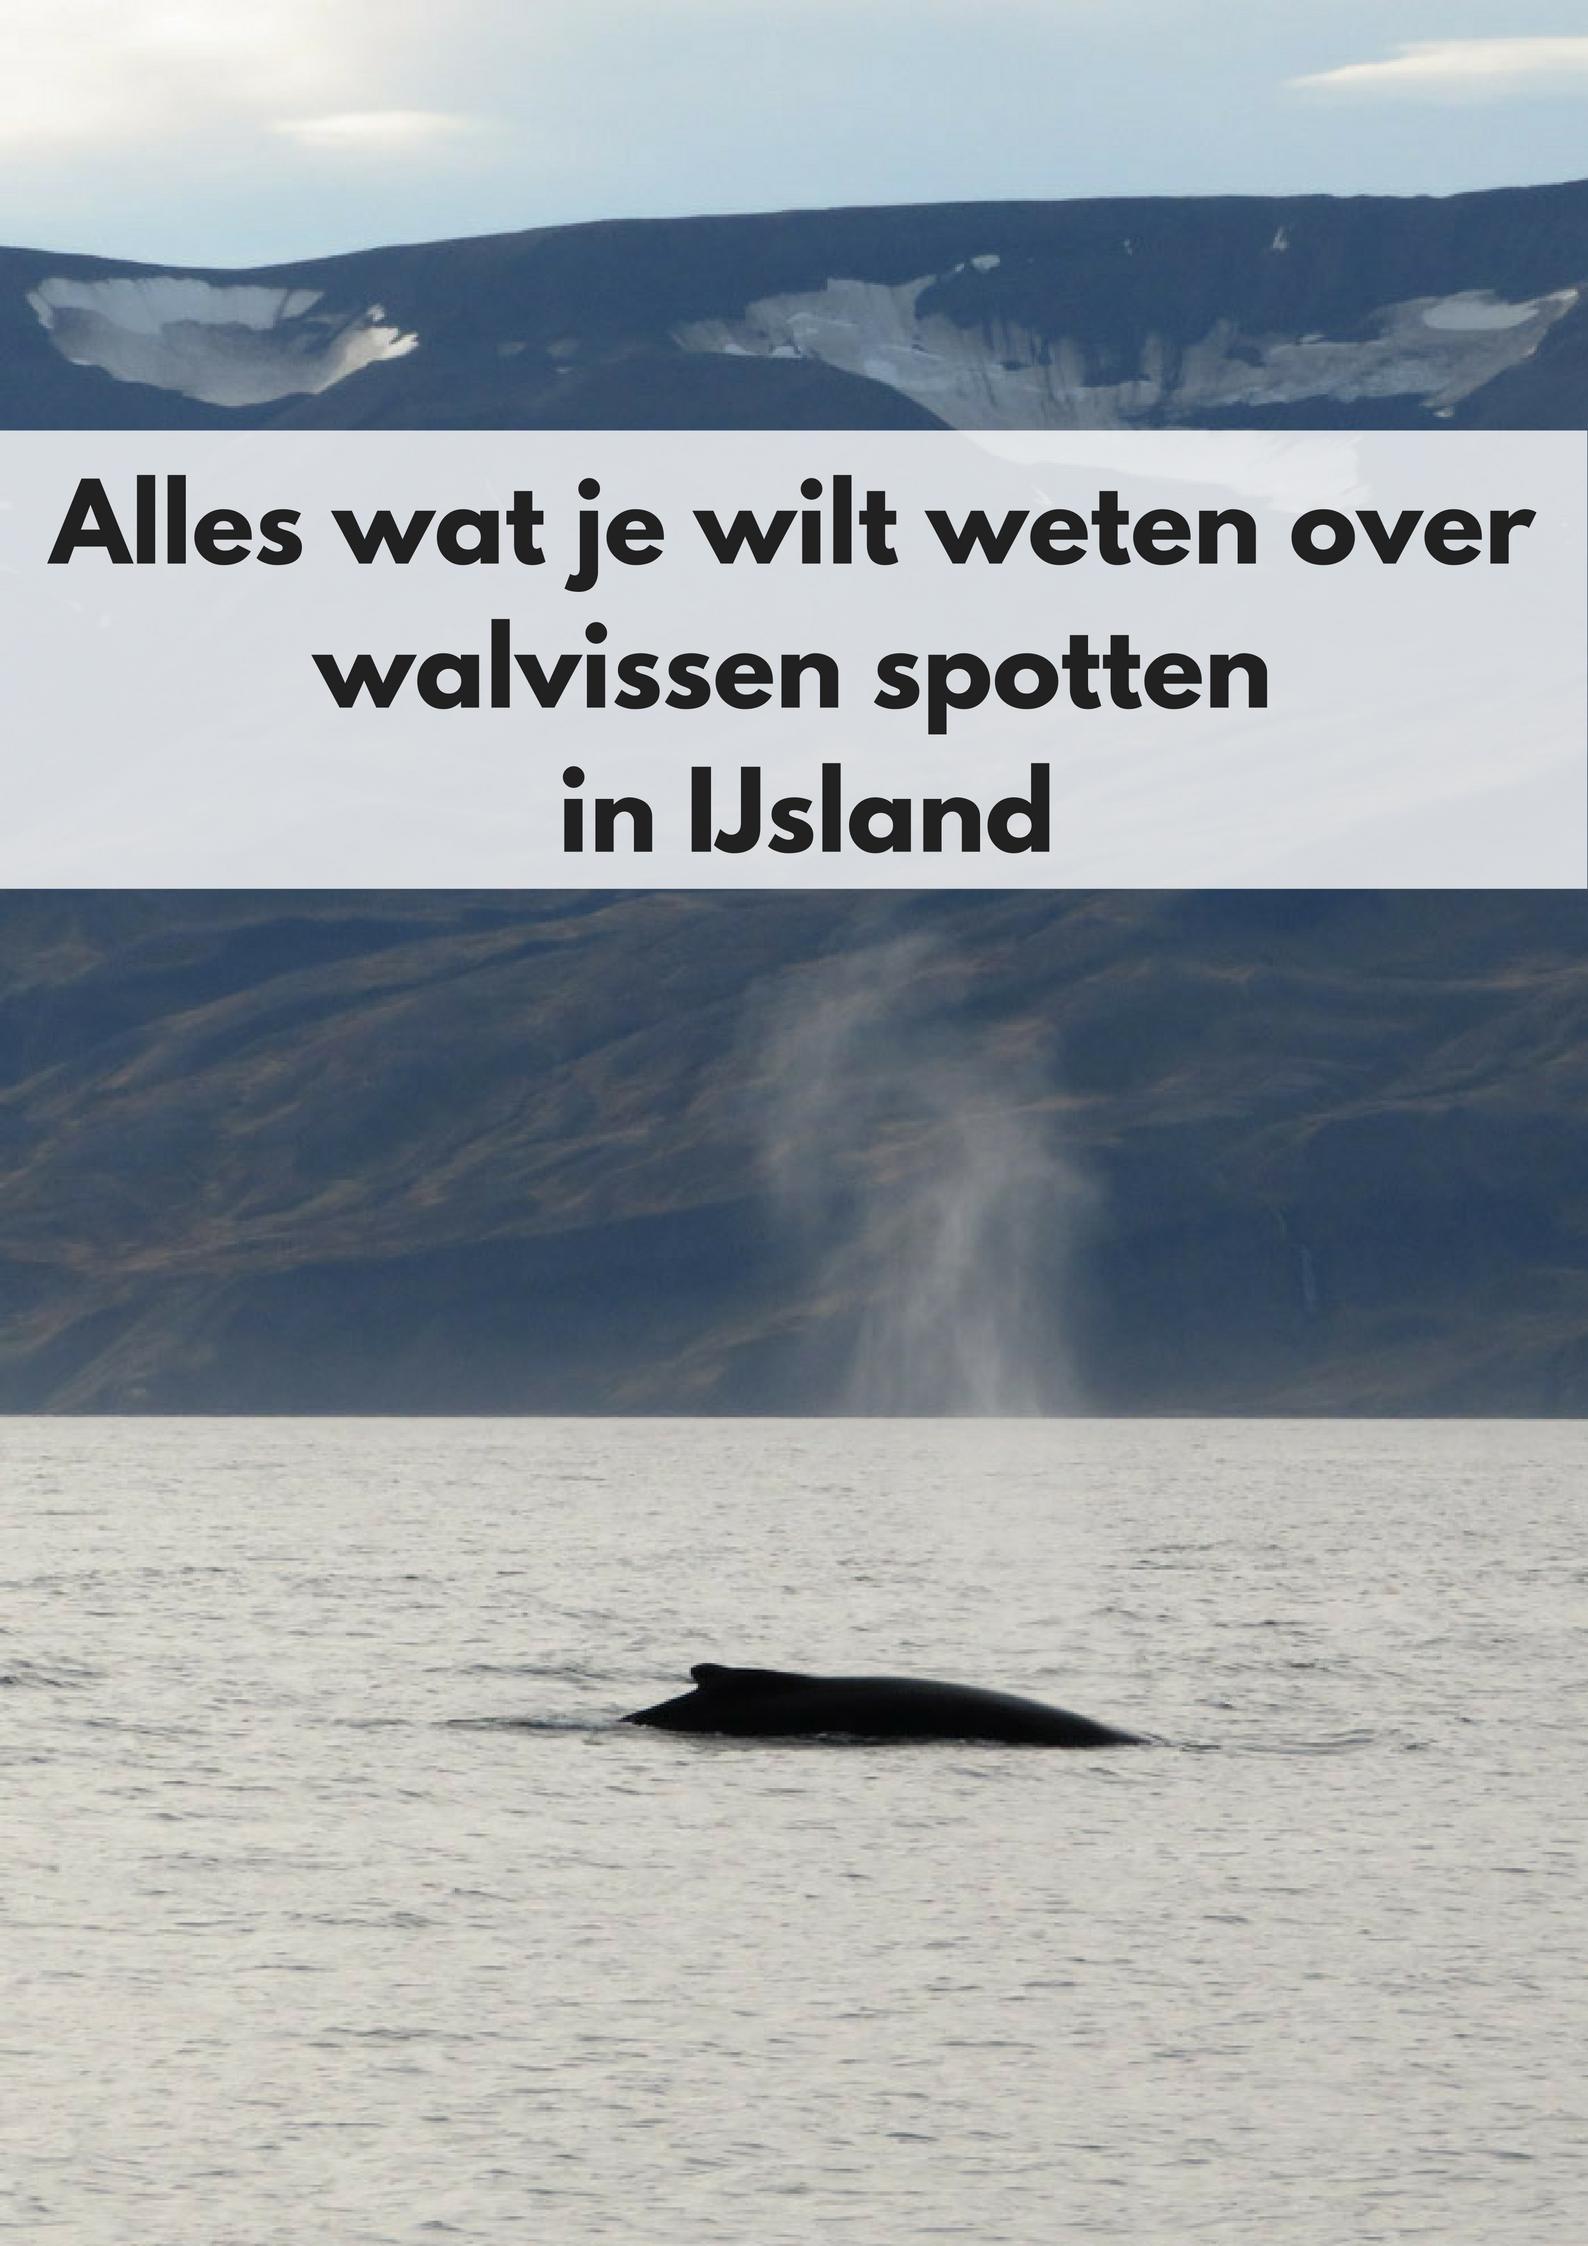 Alles wat je wilt weten over walvissen spotten in Húsavik, IJsland - Map of Joy